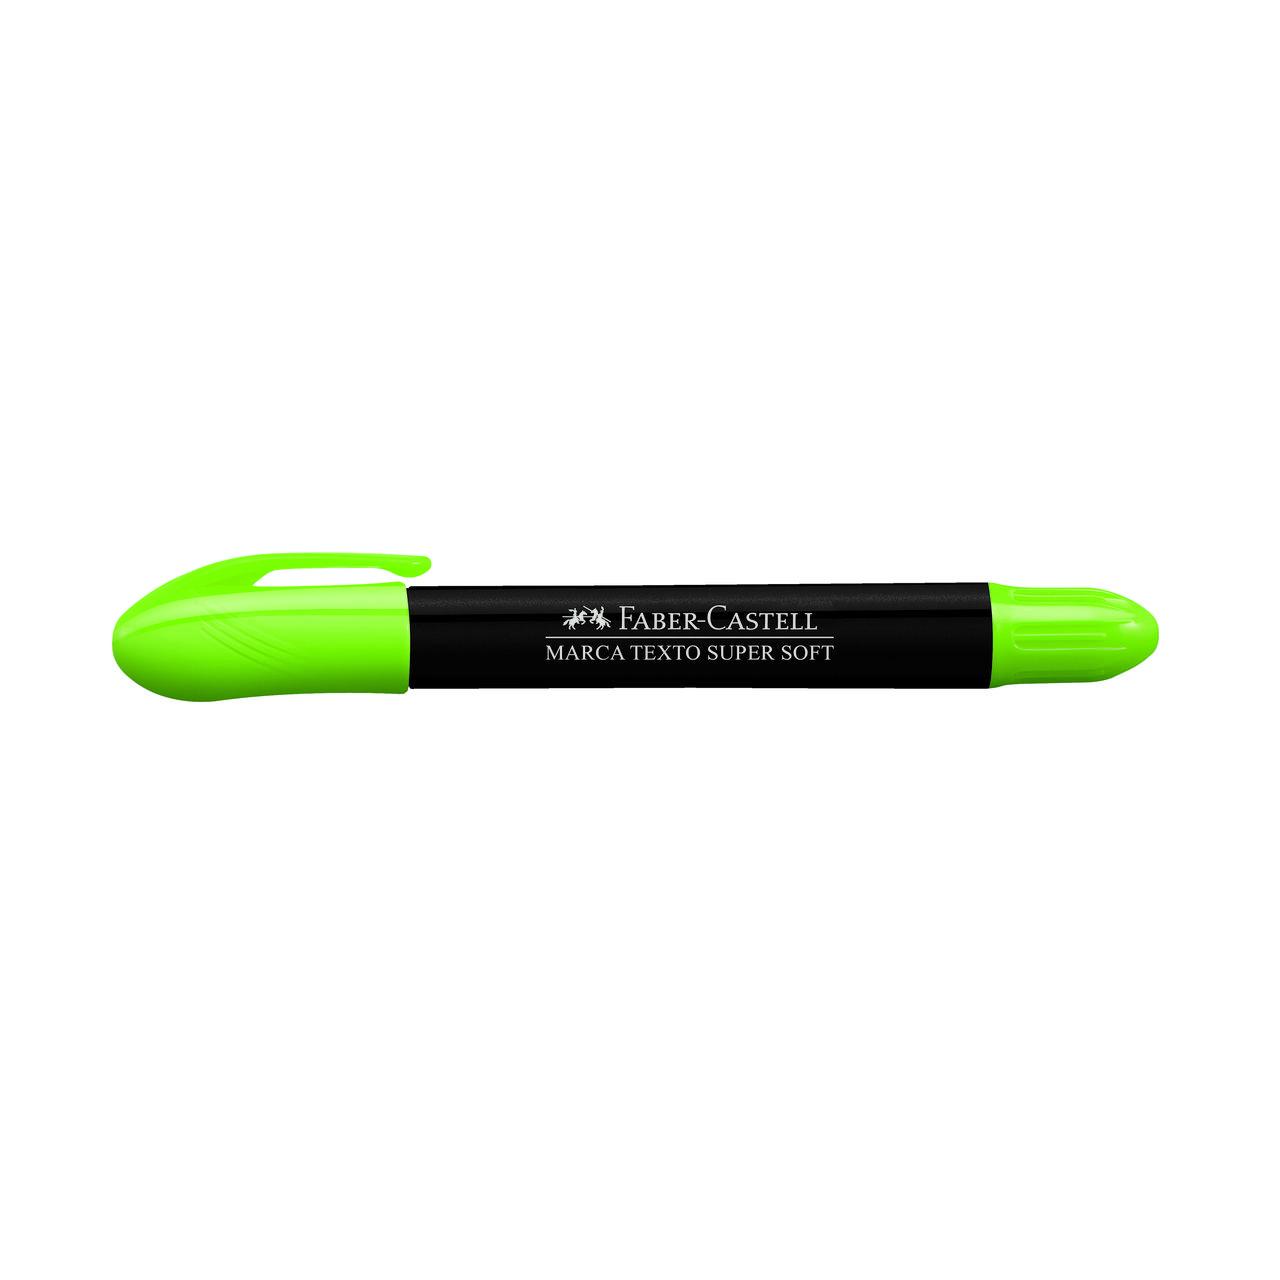 Marca texto gel verde Faber-Castell